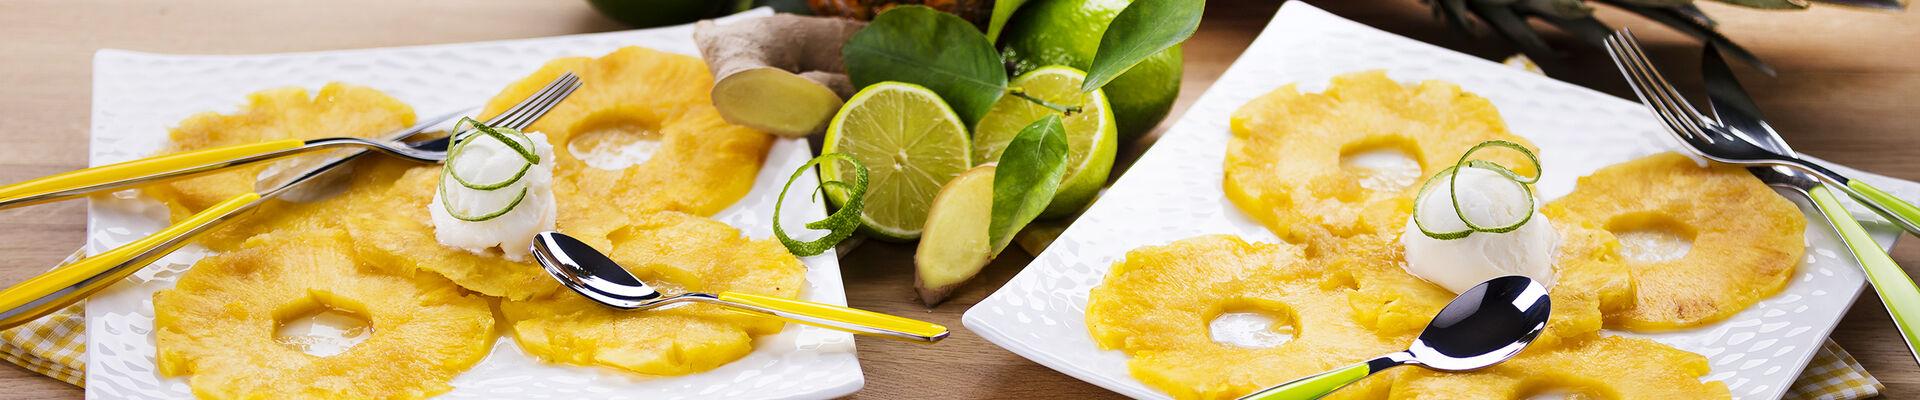 Carpaccio d'ananas vanille gingembre